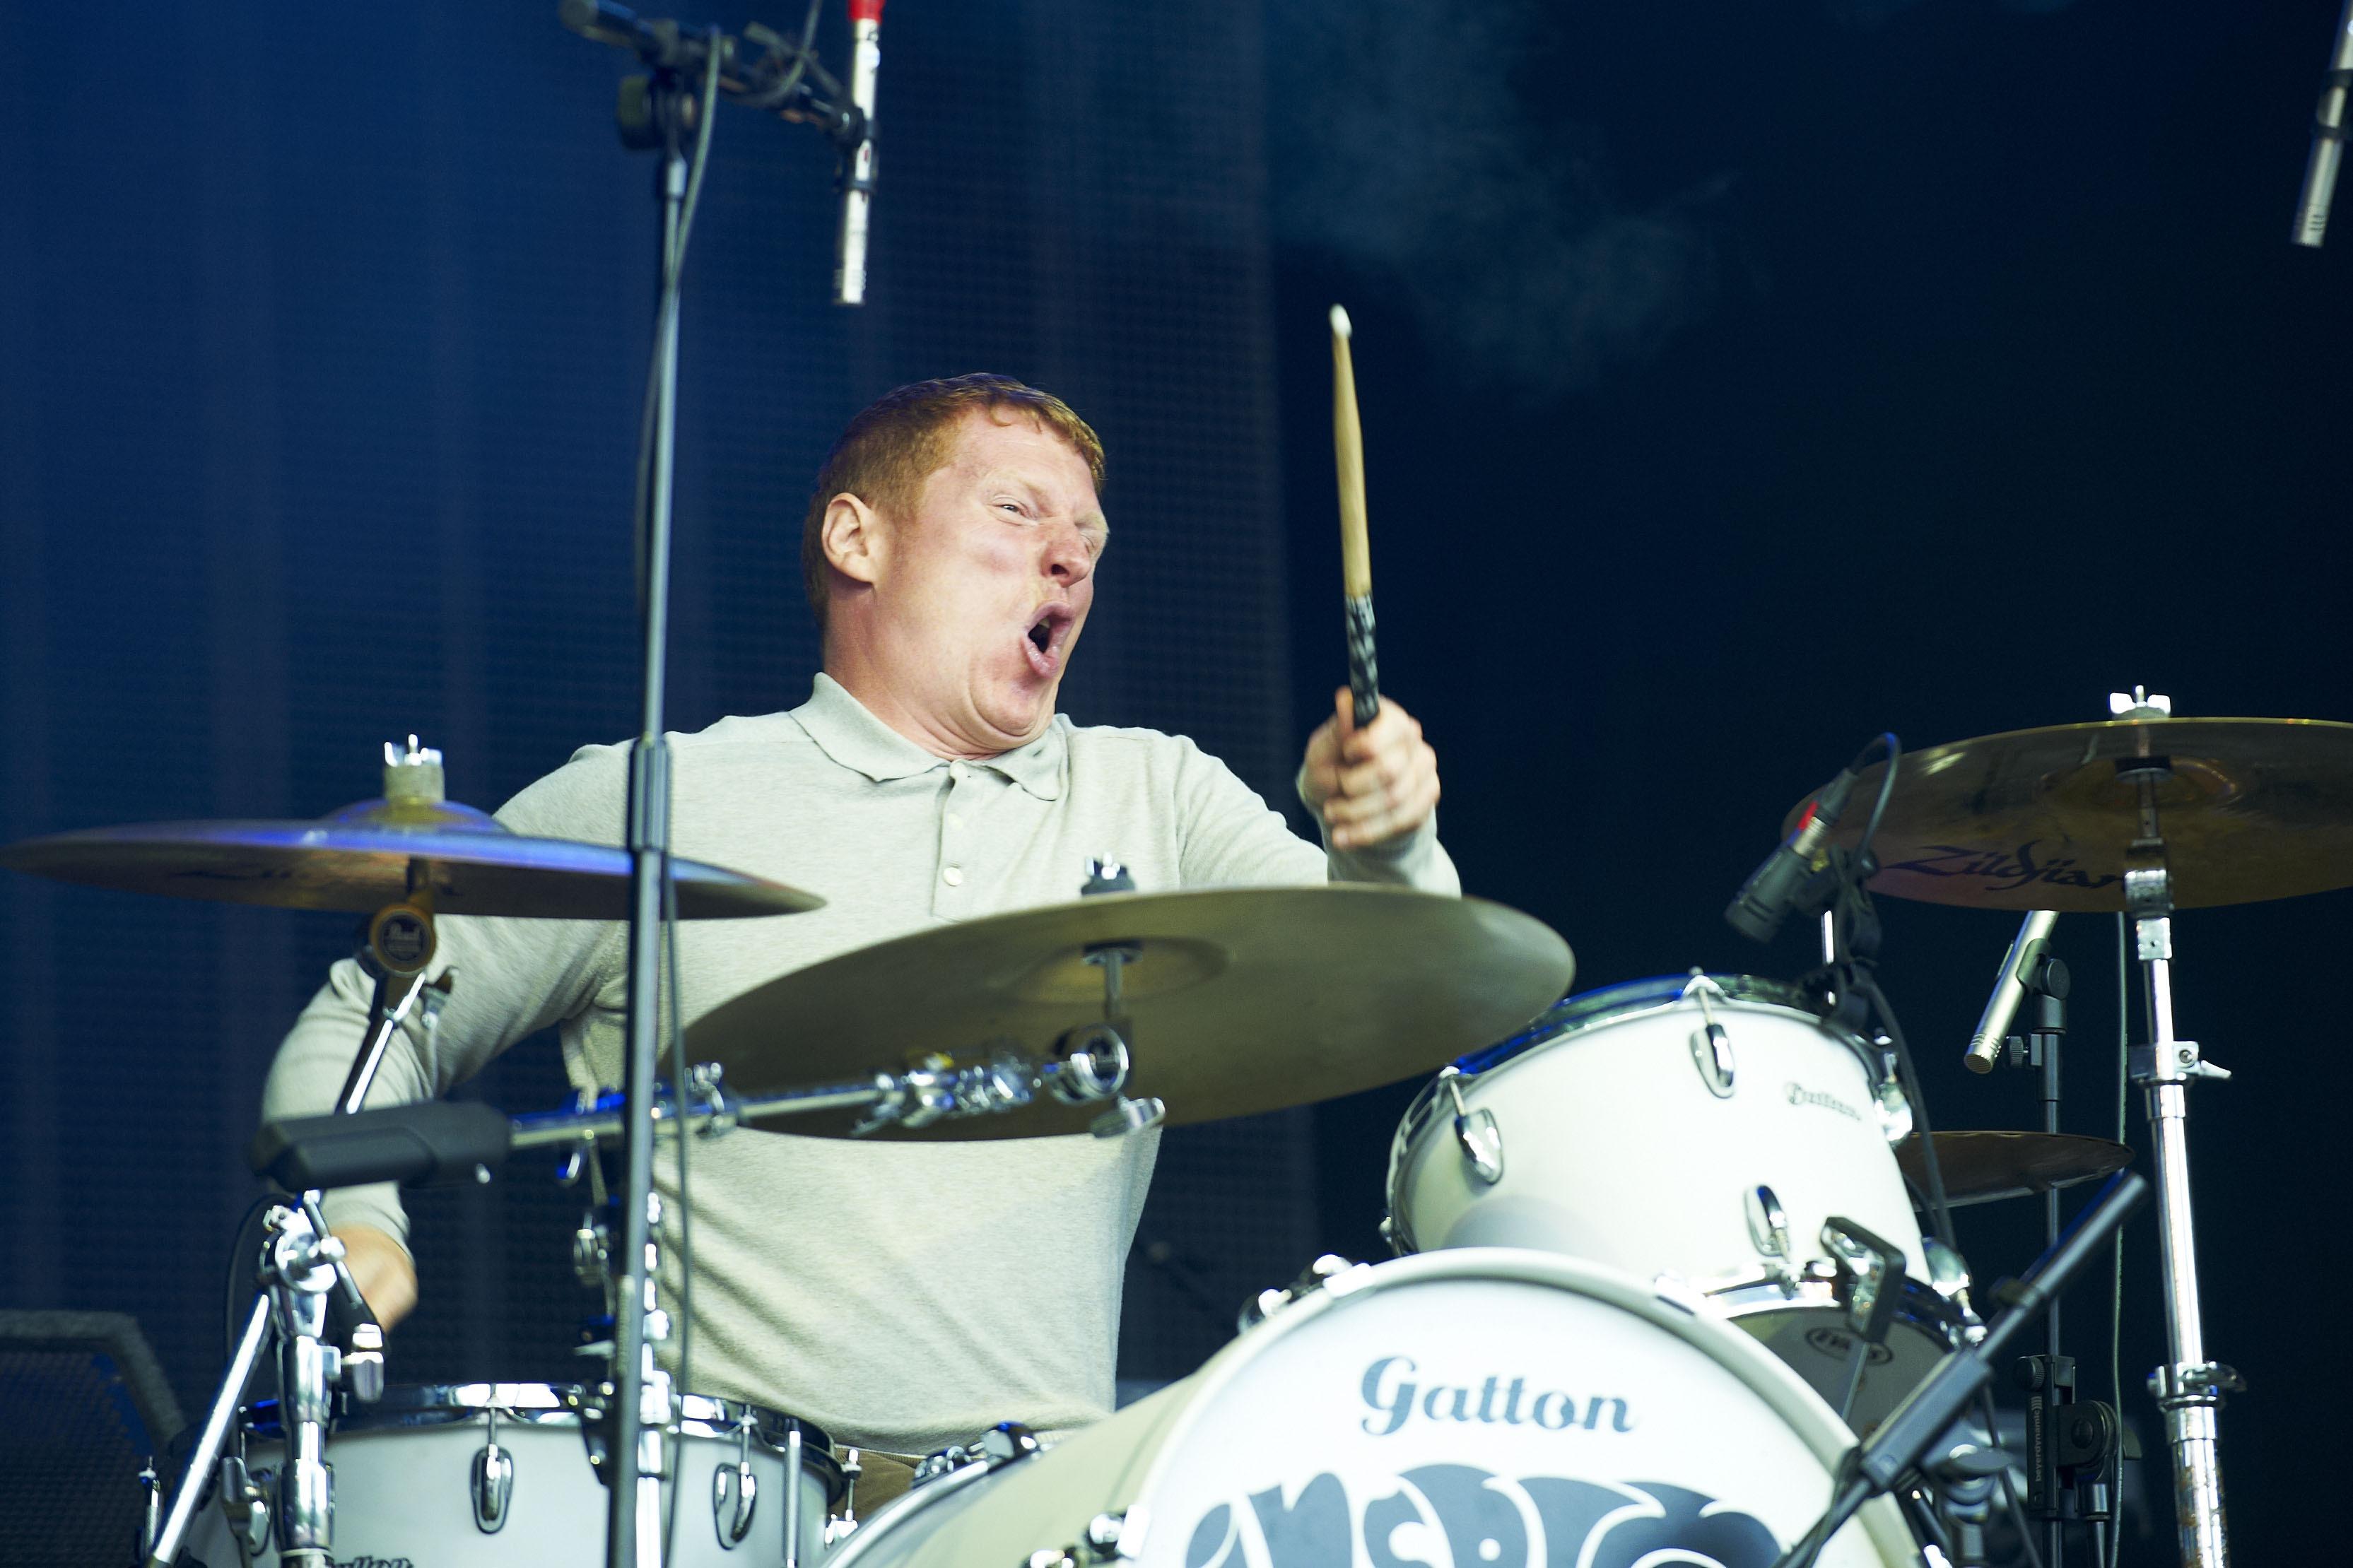 Craig Gill (1971-2016)